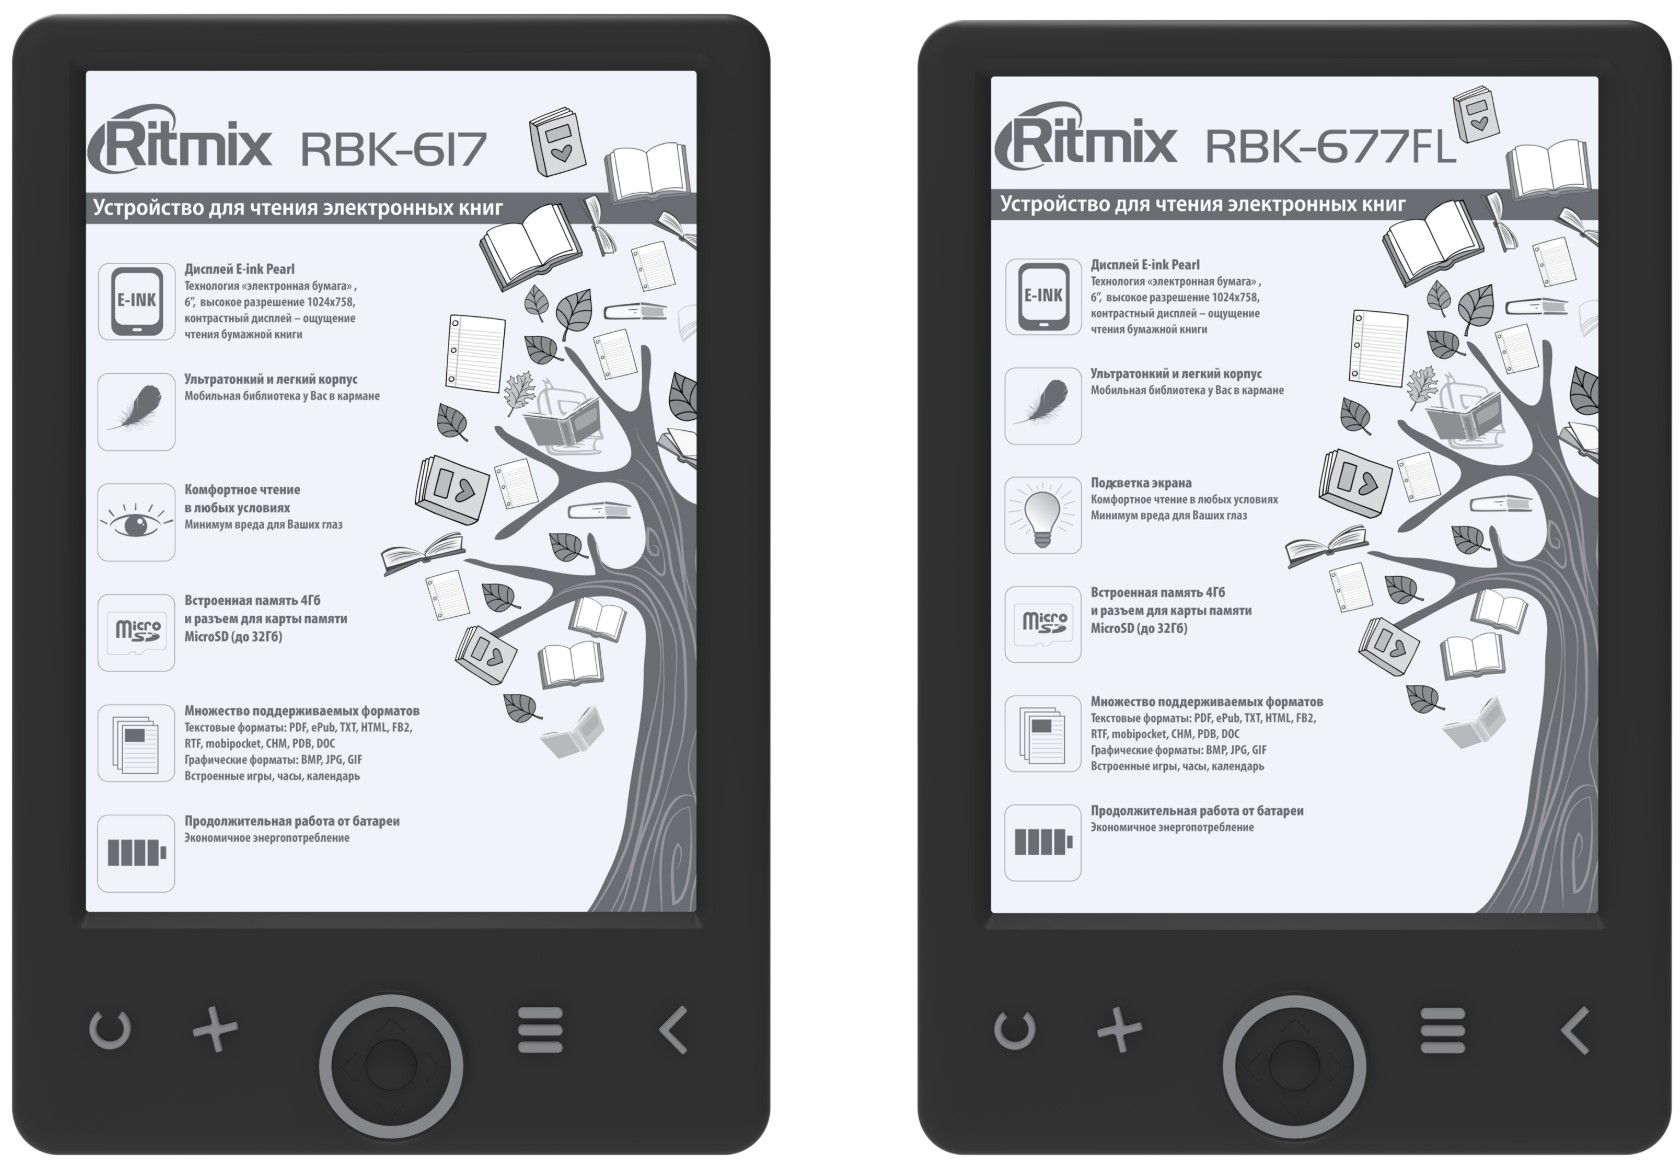 Ritmix RBK-677FL